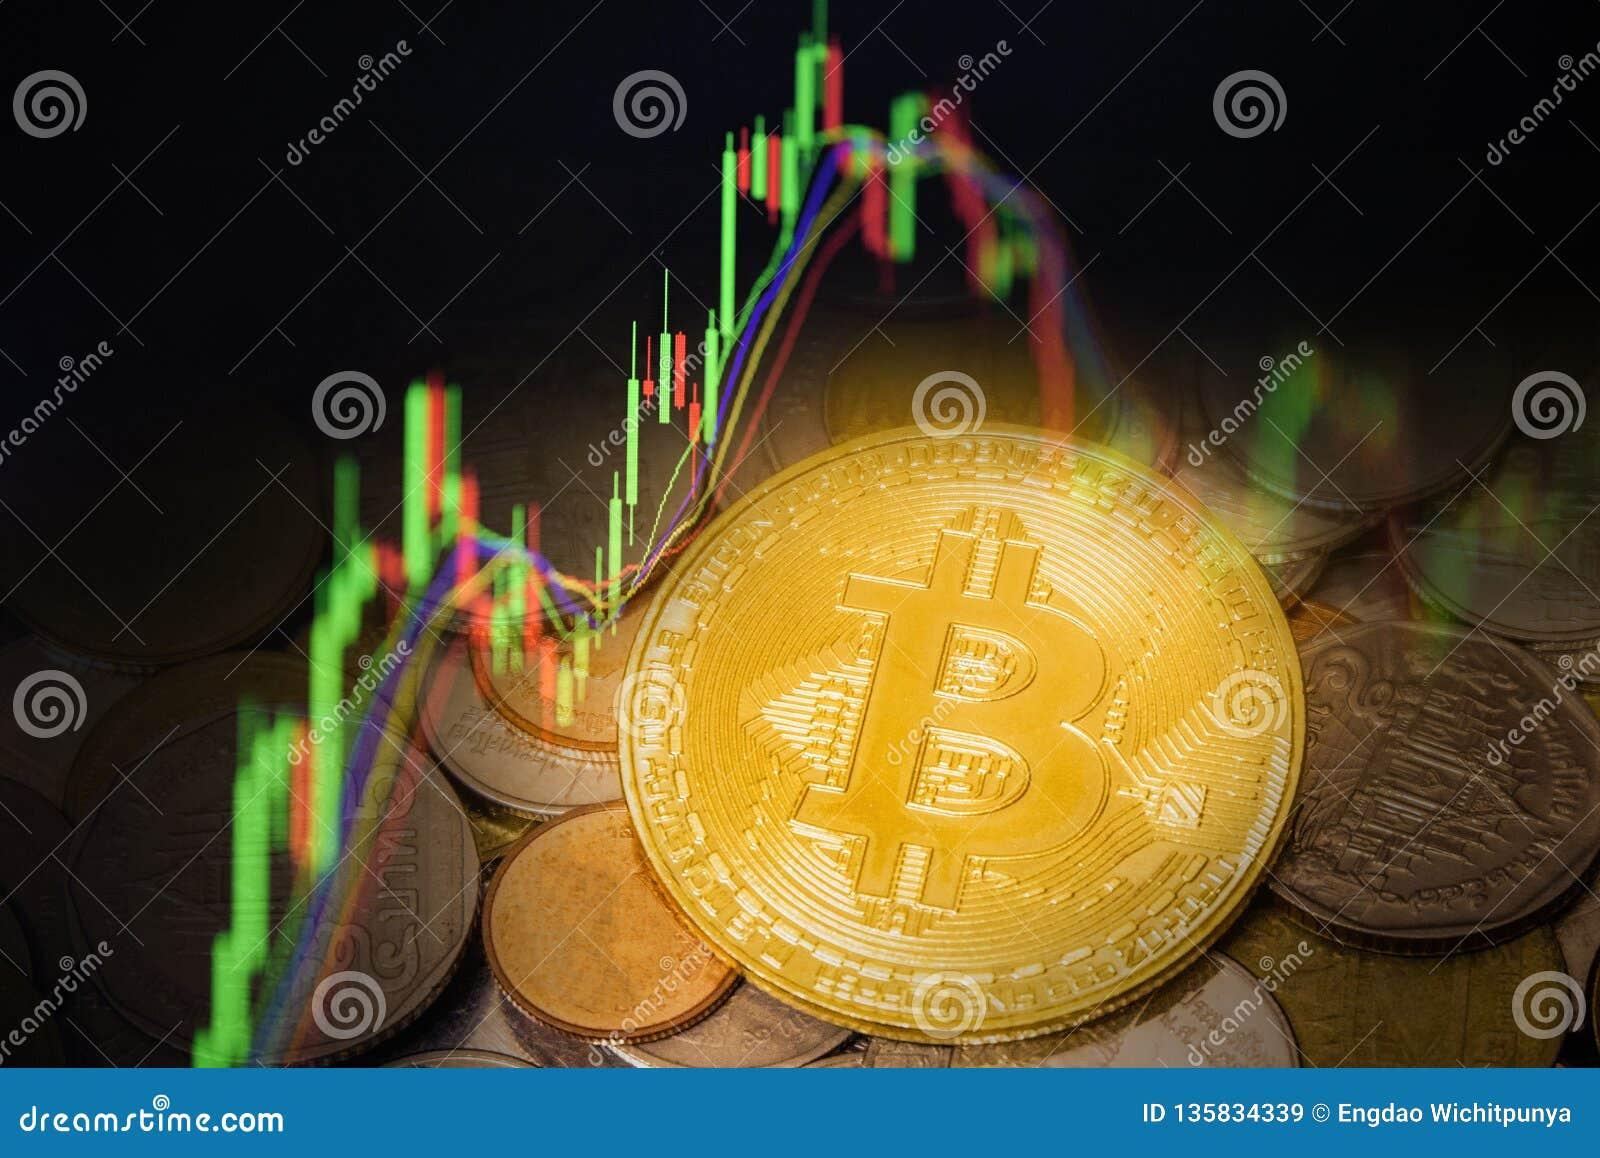 GKFX Bitcoin Trading 2020 - acum la oferta de broker